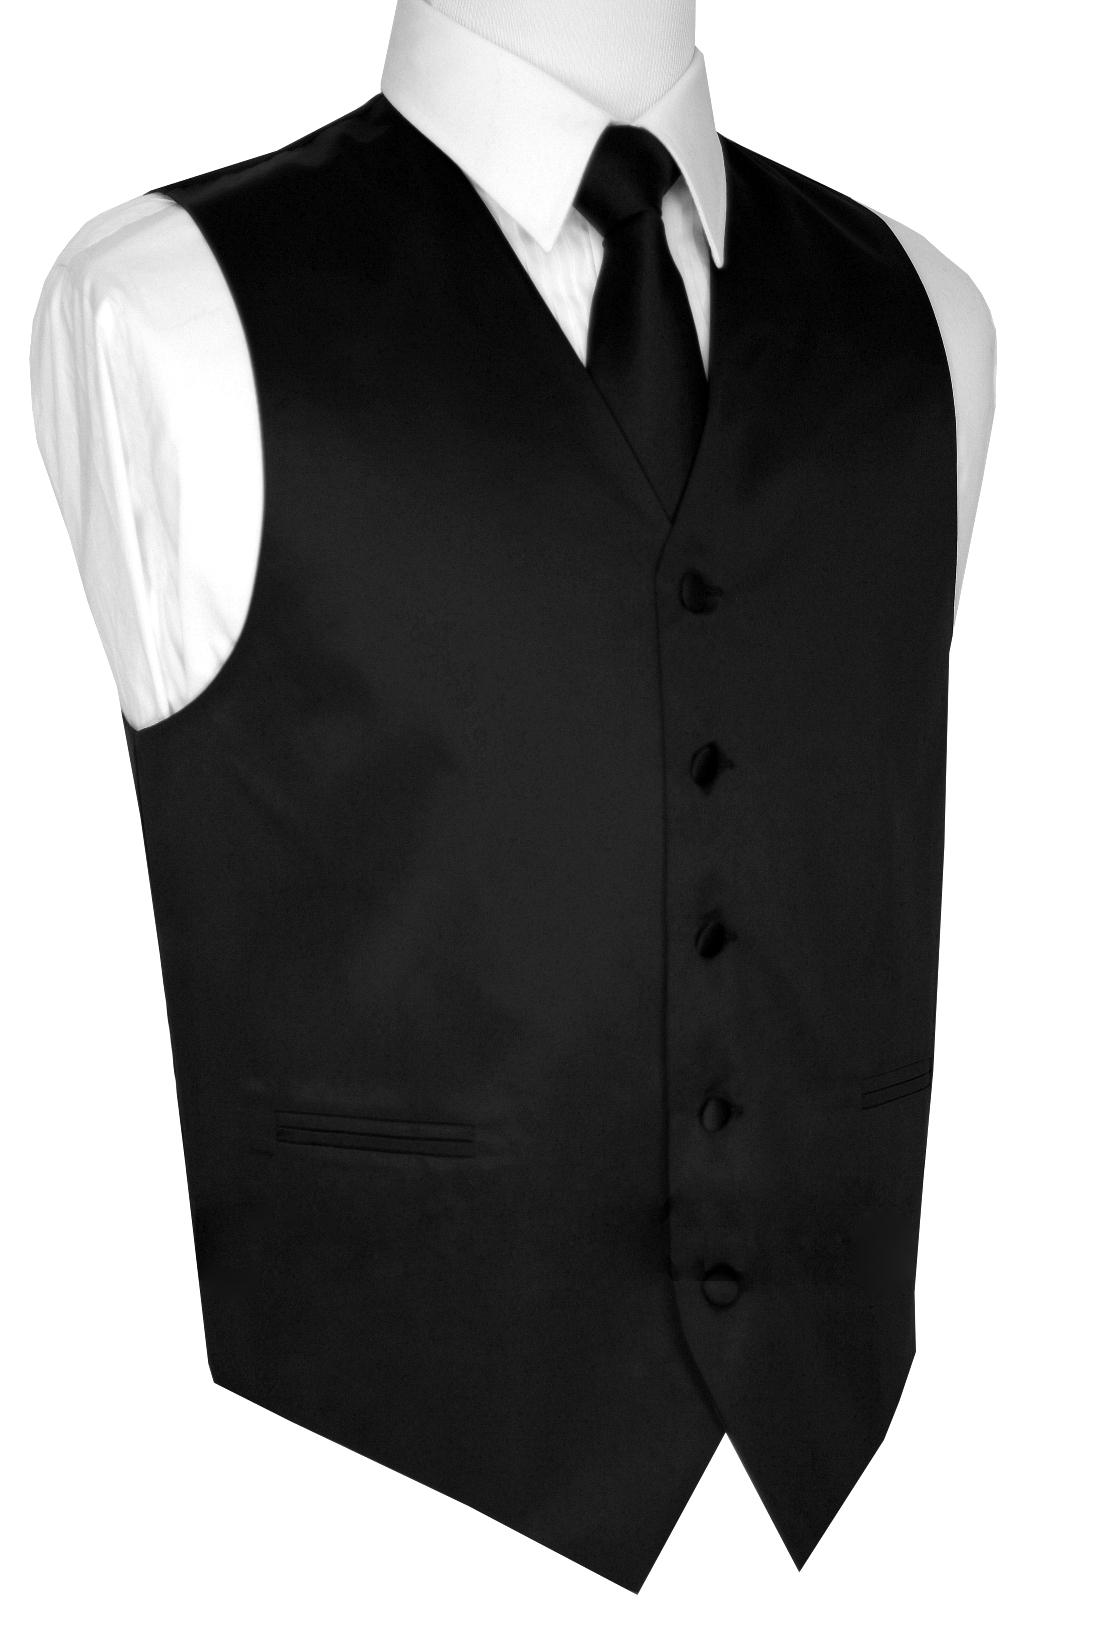 Italian Design, Men's Tuxedo Vest, Tie & Hankie Set - Black